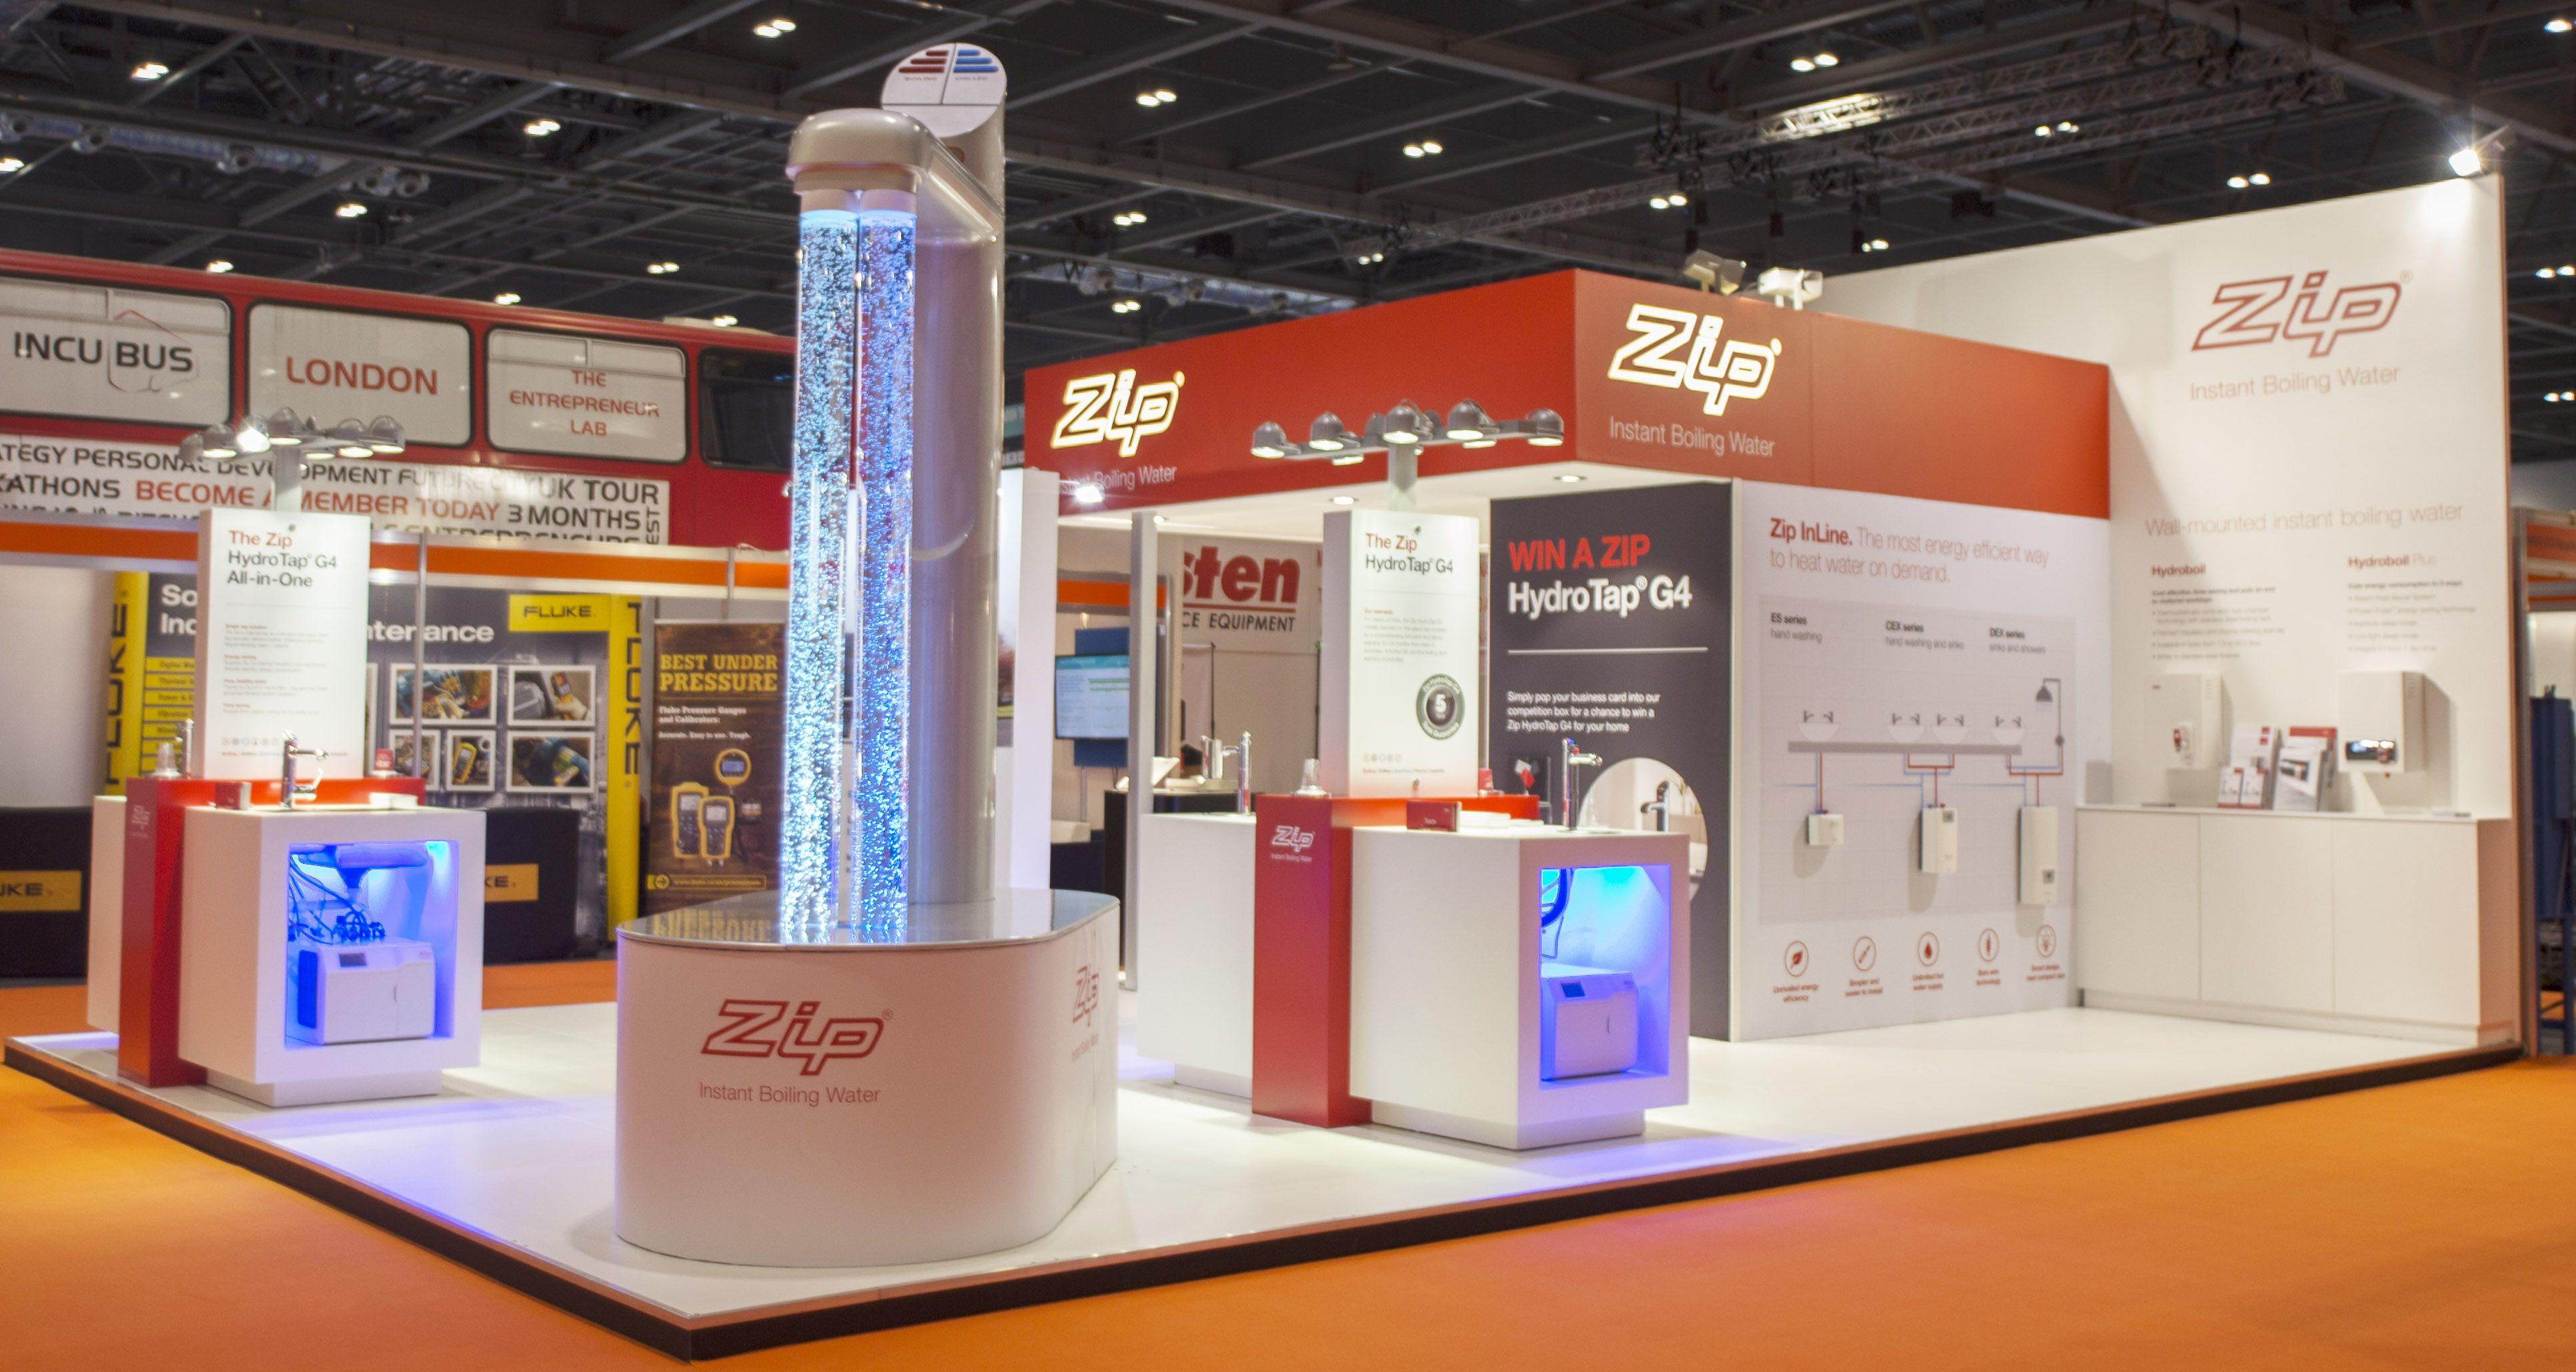 Exhibition Stand Design Build : Exhibition design at facilities show zip heaters exhibition